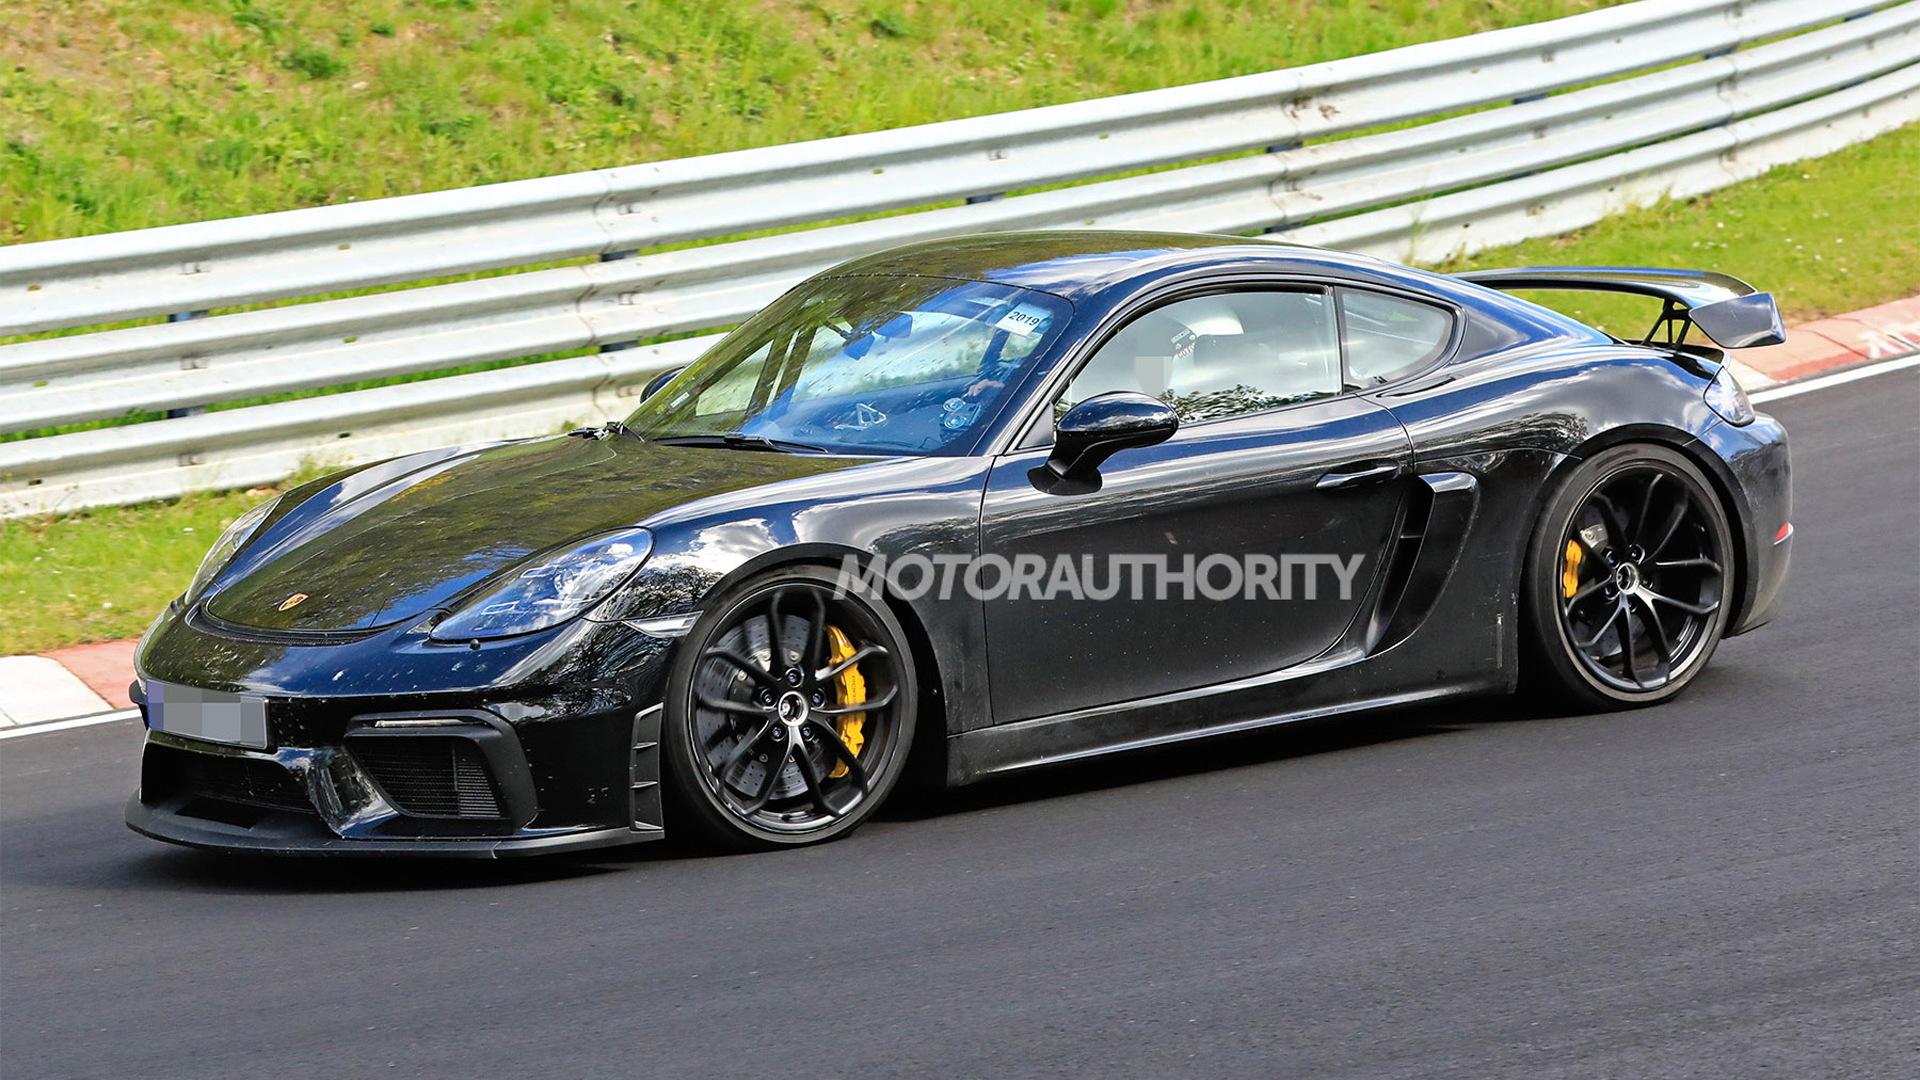 2020 Porsche 718 Cayman GT4 spy shots - Image via S. Baldauf/SB-Medien